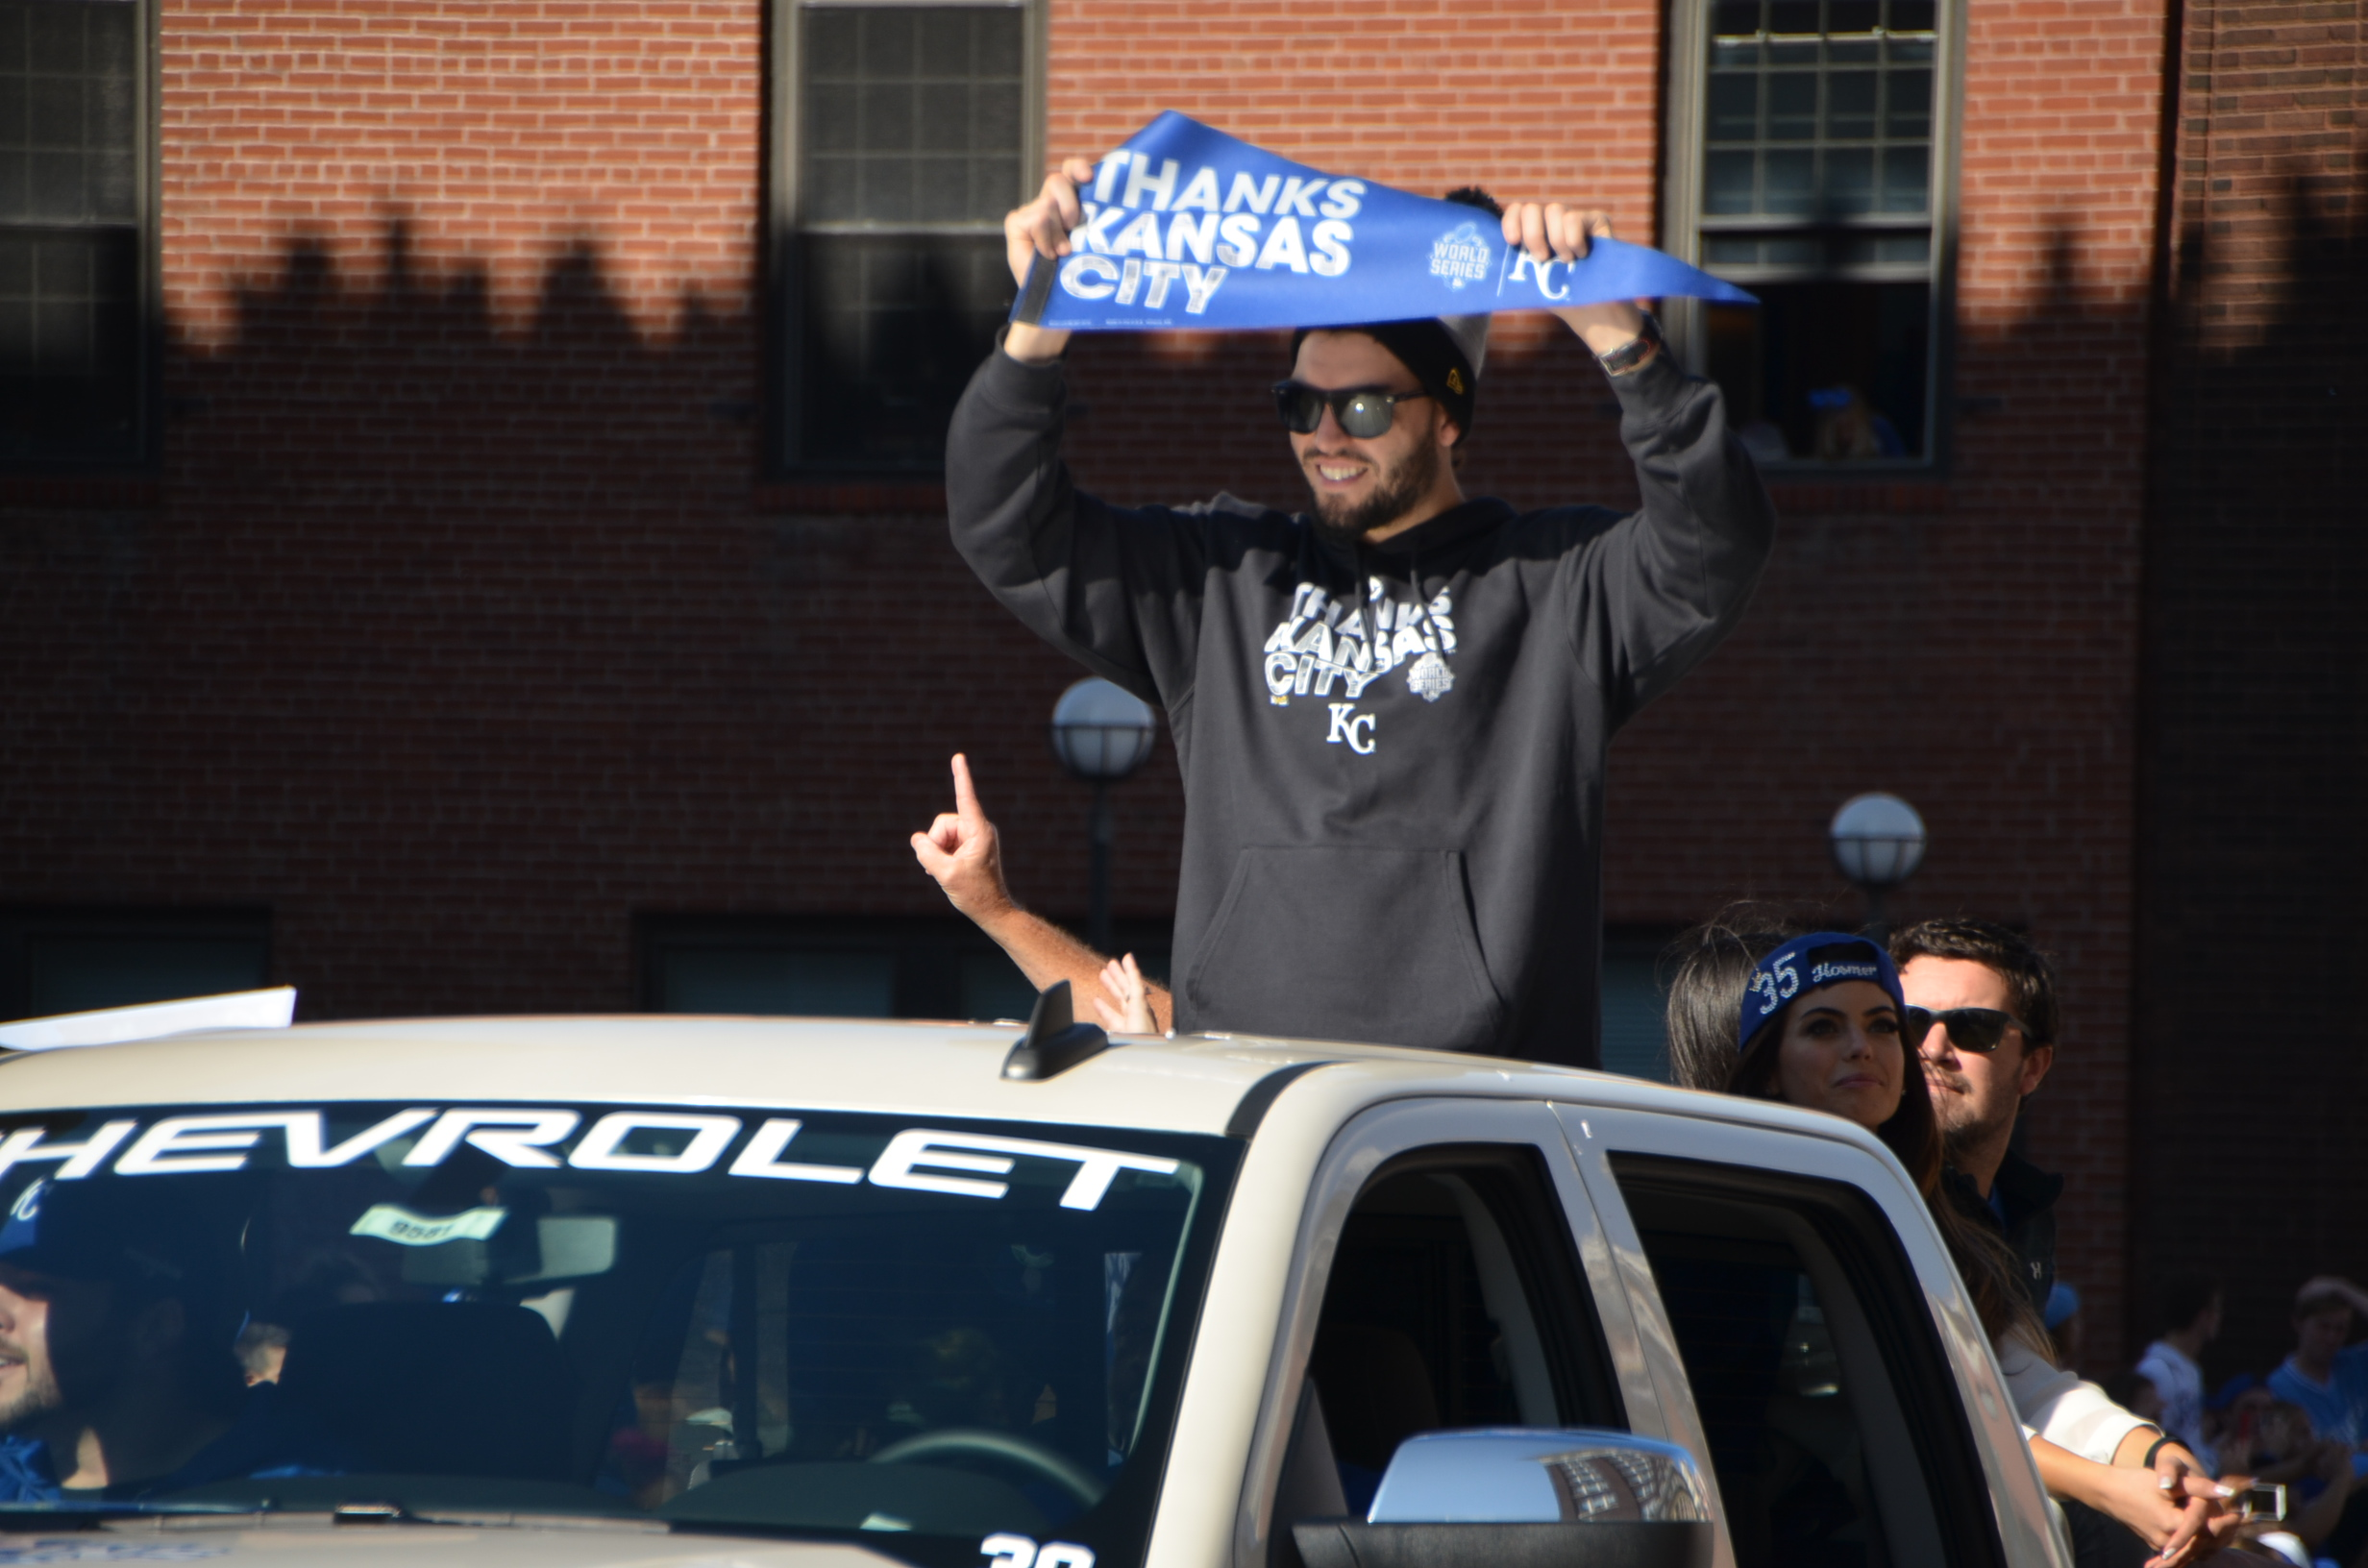 Kansas City Royals win World Series: #takethecrown